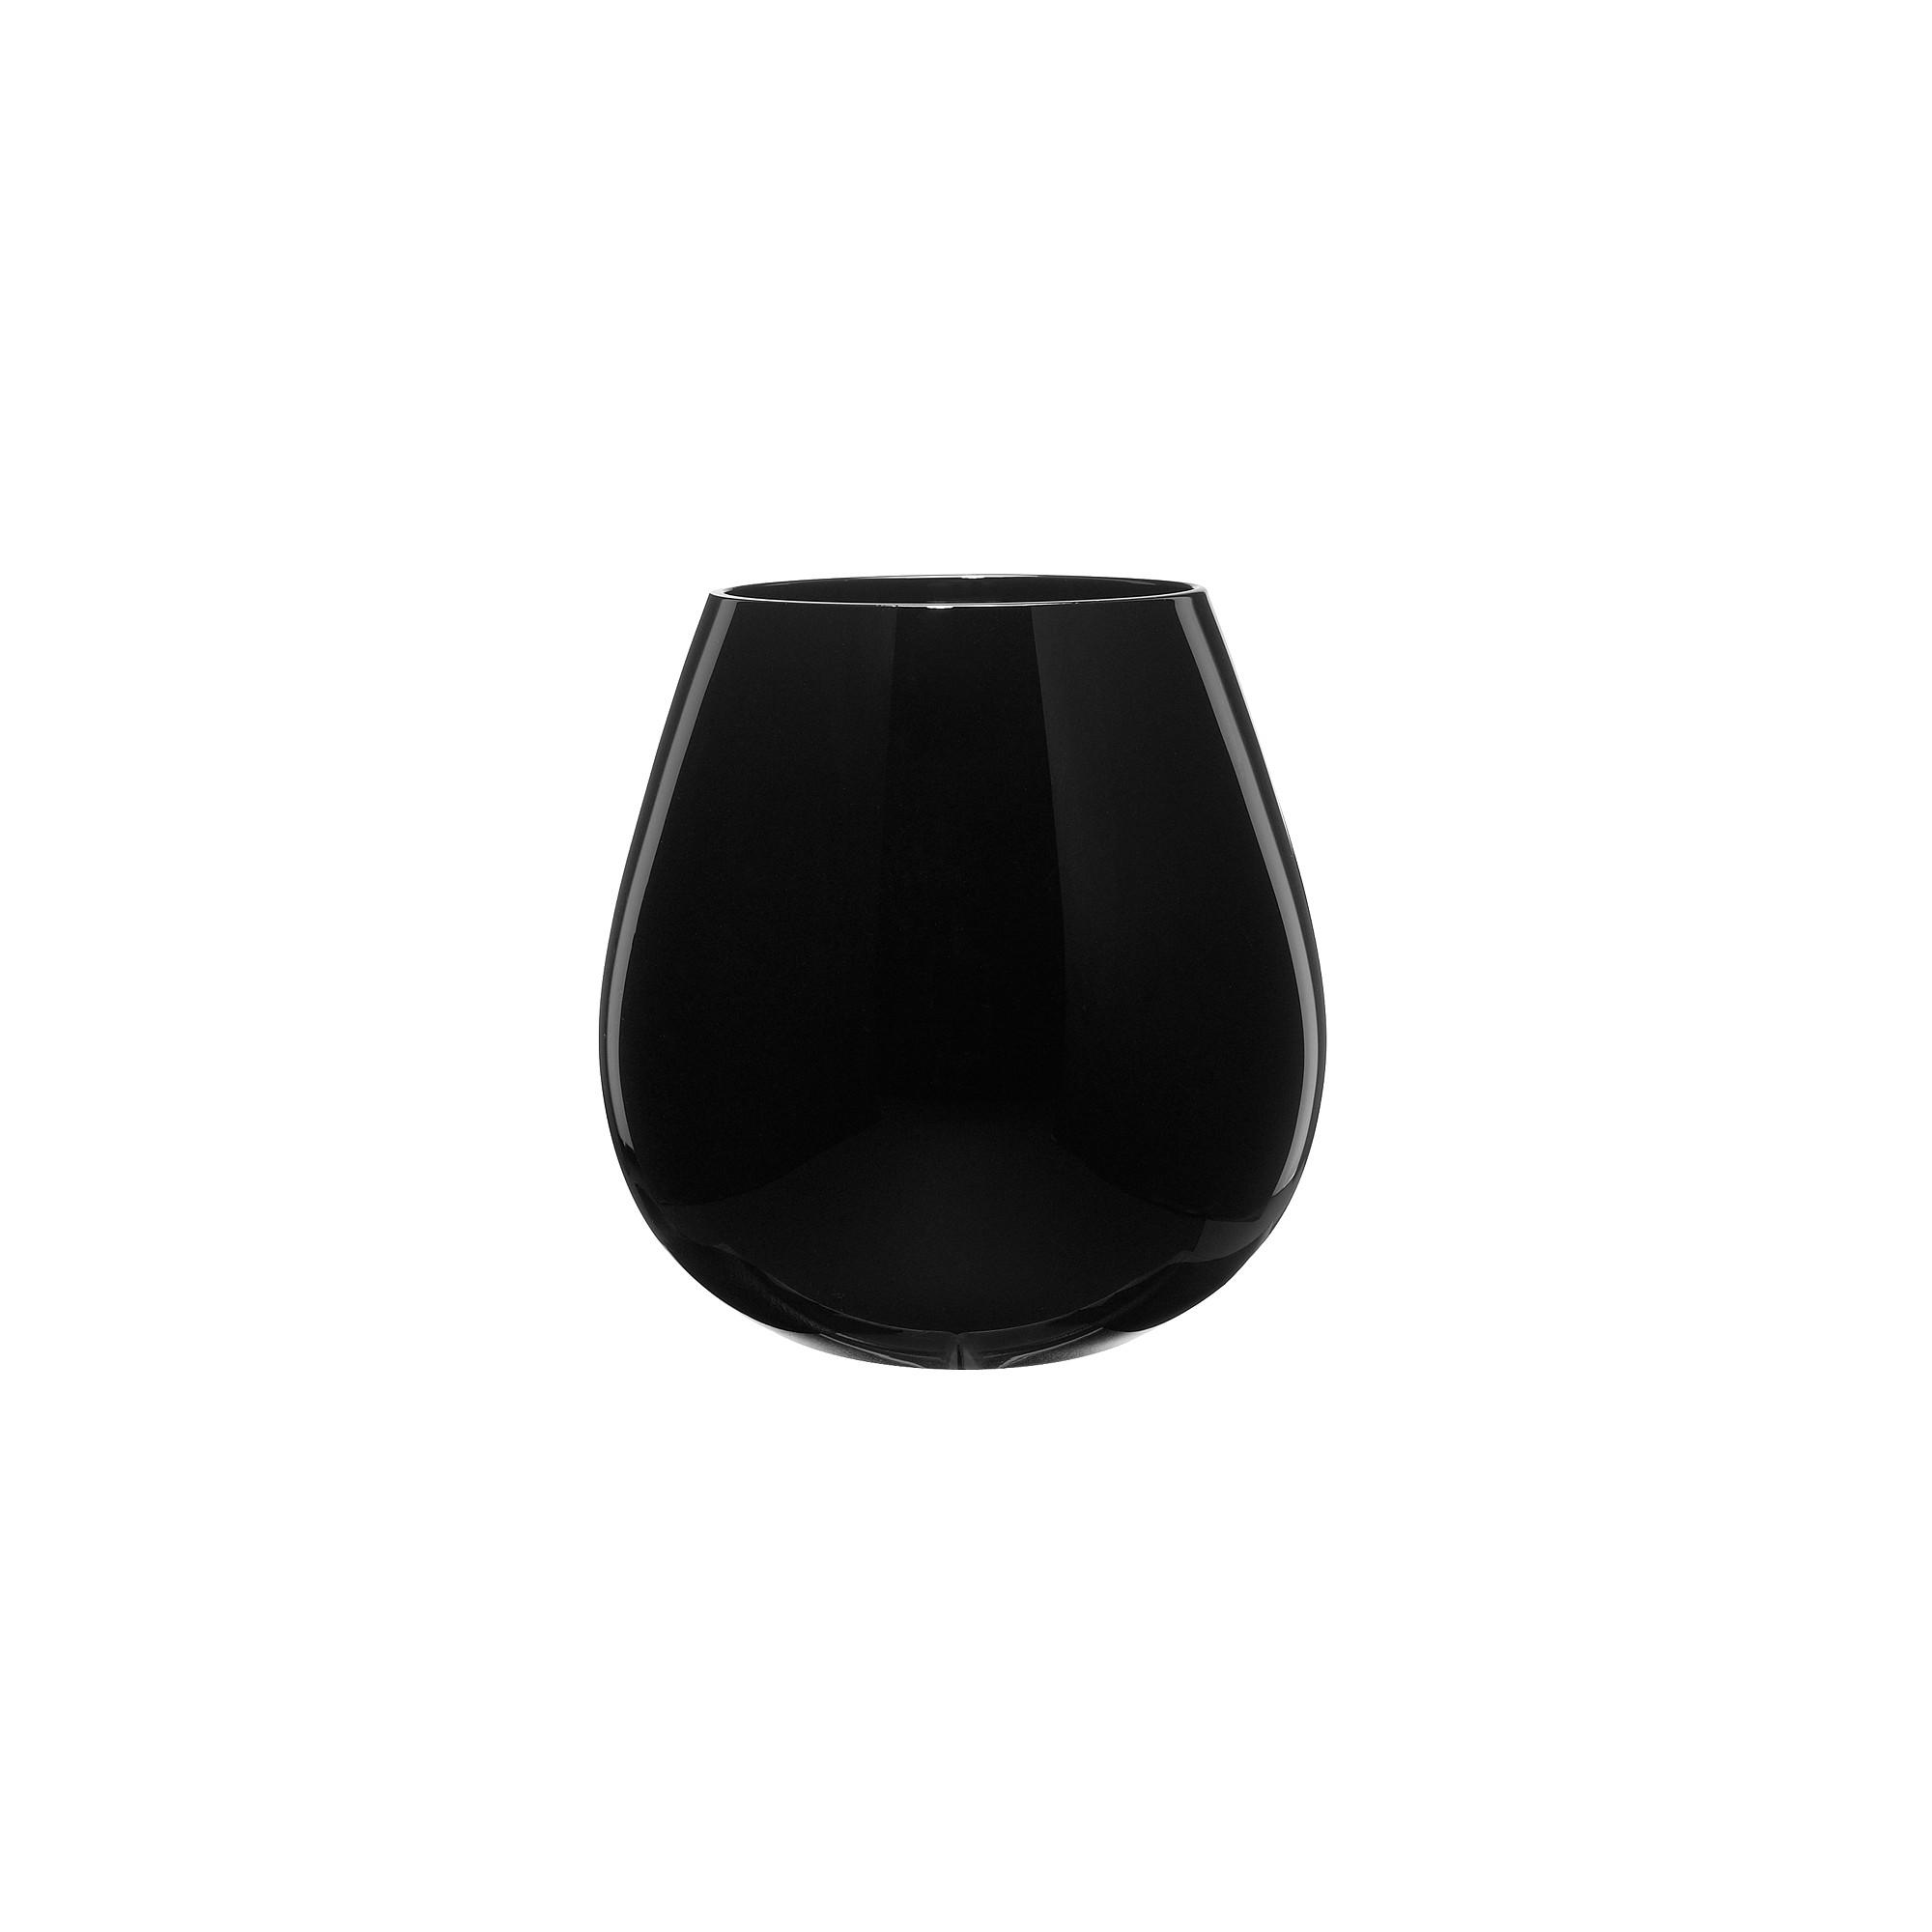 Artland 22oz 4pk Round Stemless Wine Glasses Black